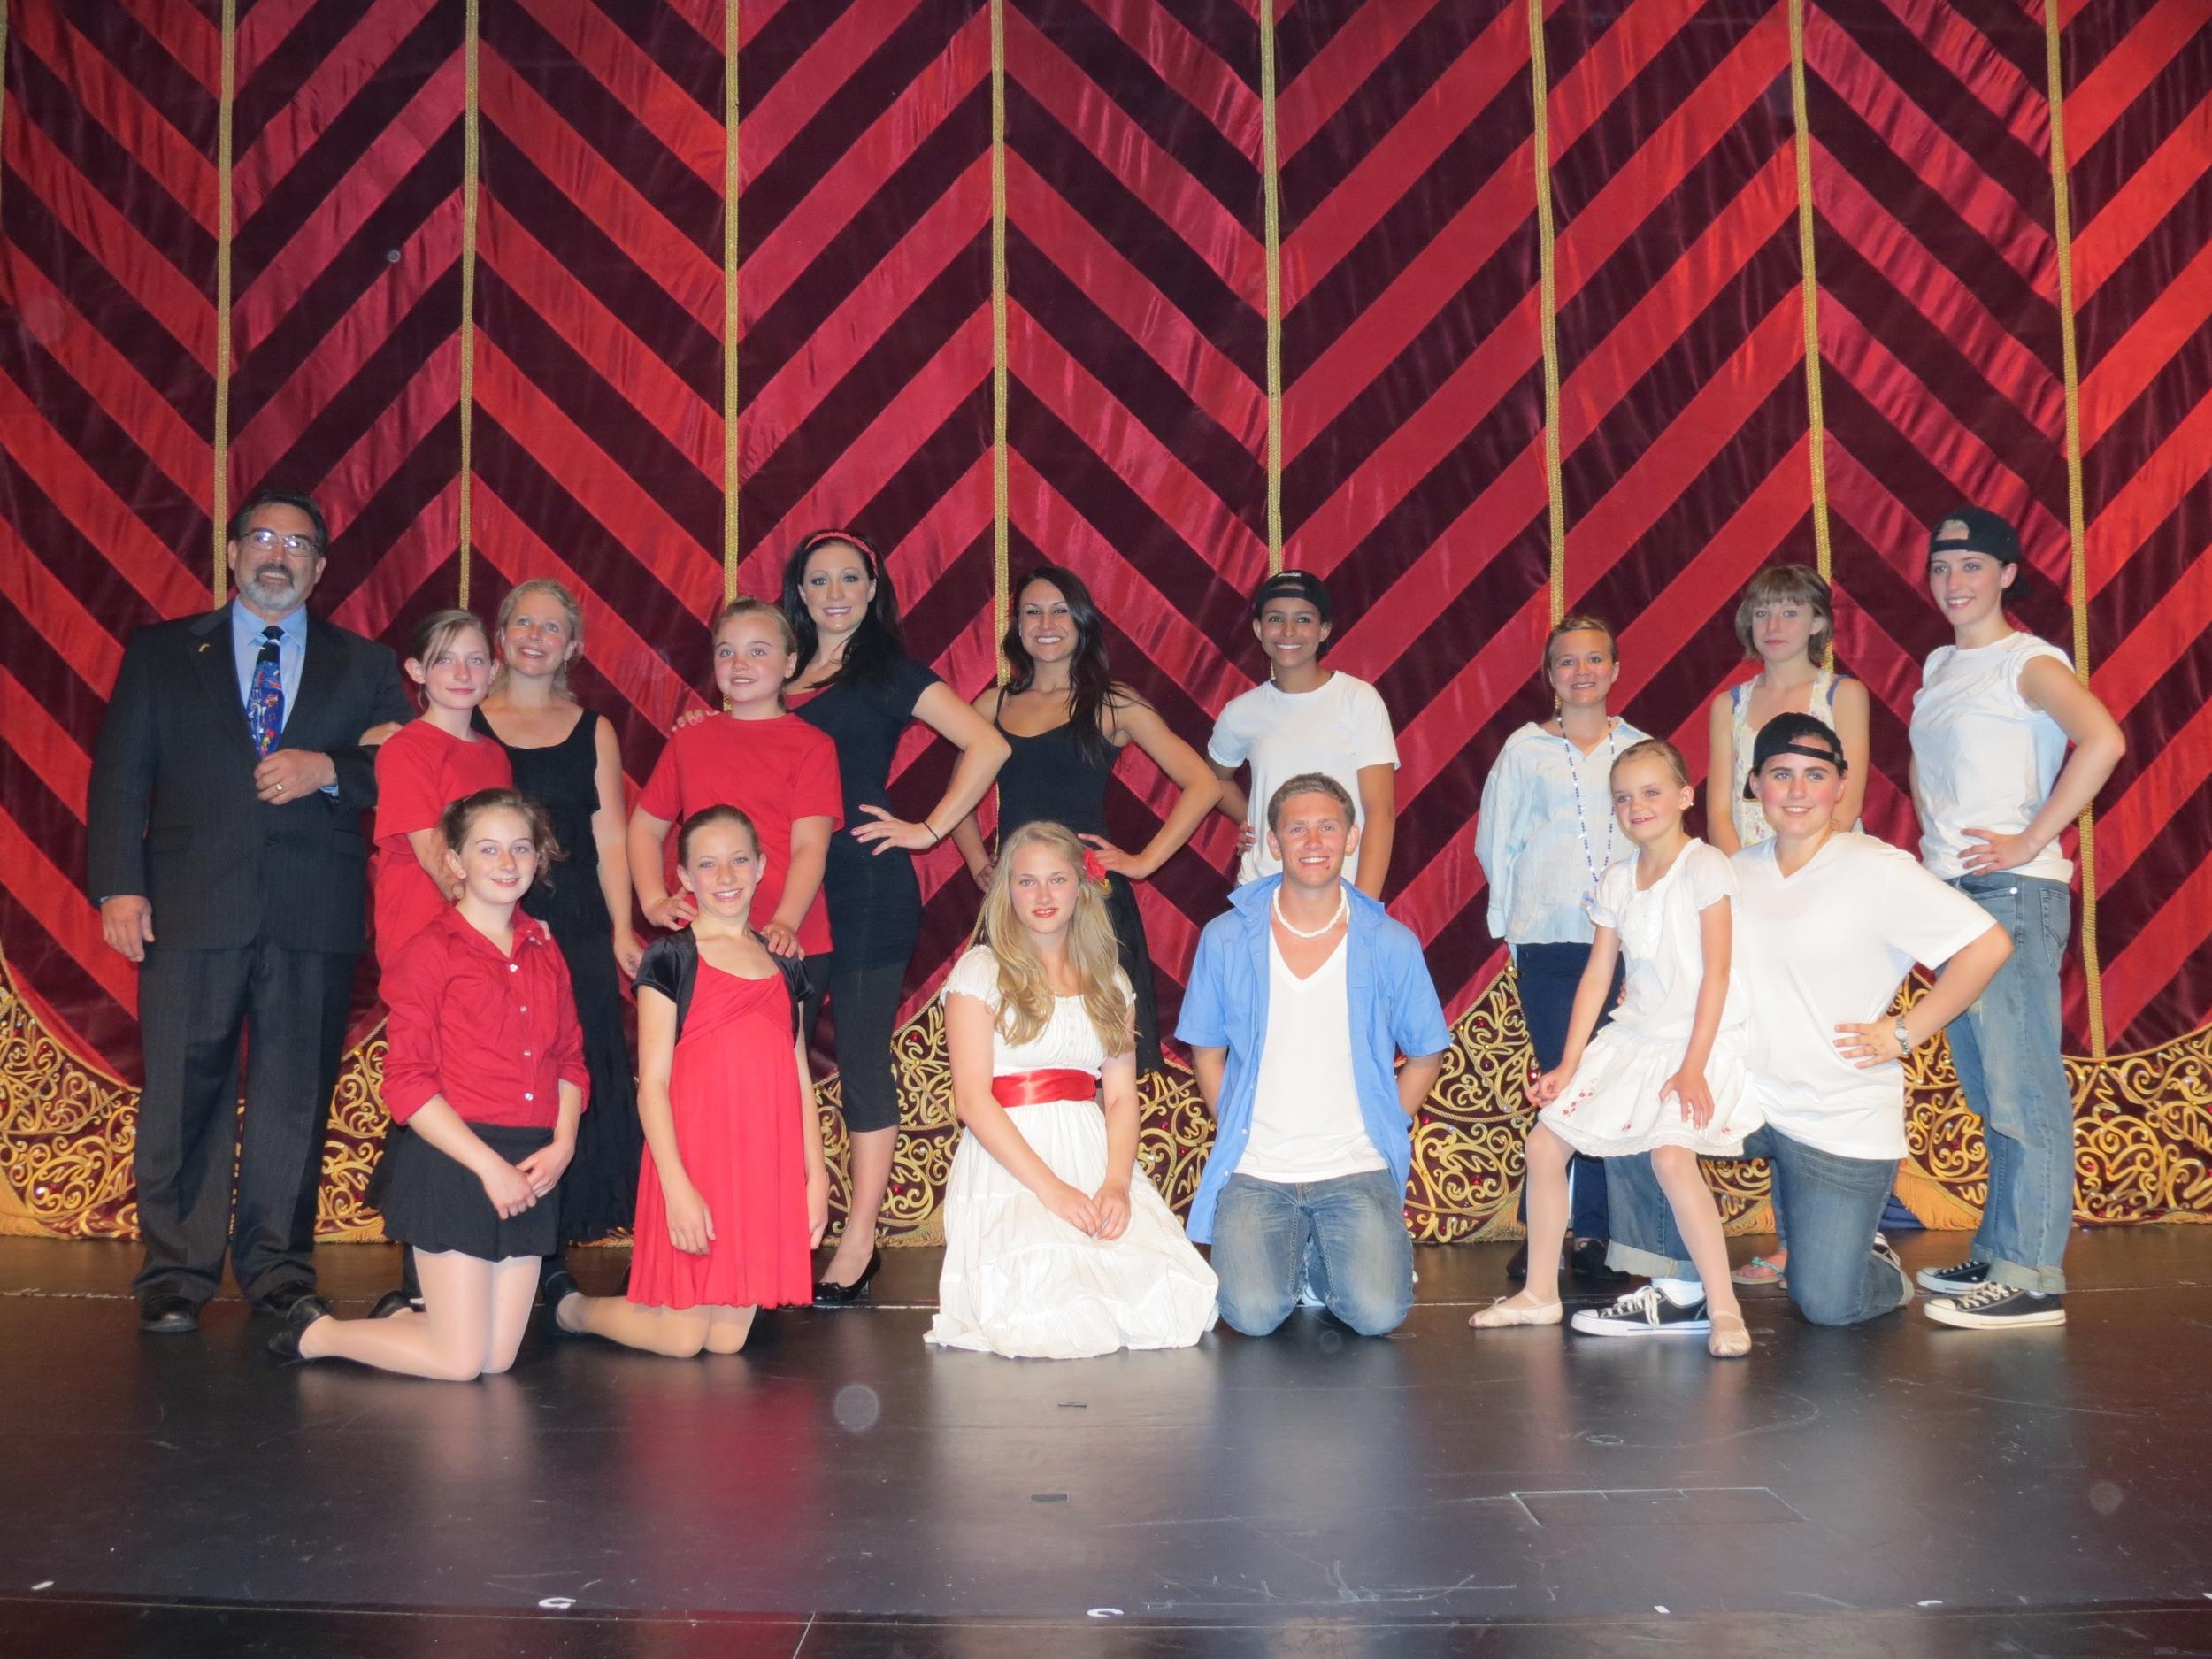 Talent Group Program: Royal Caribbean Cruise